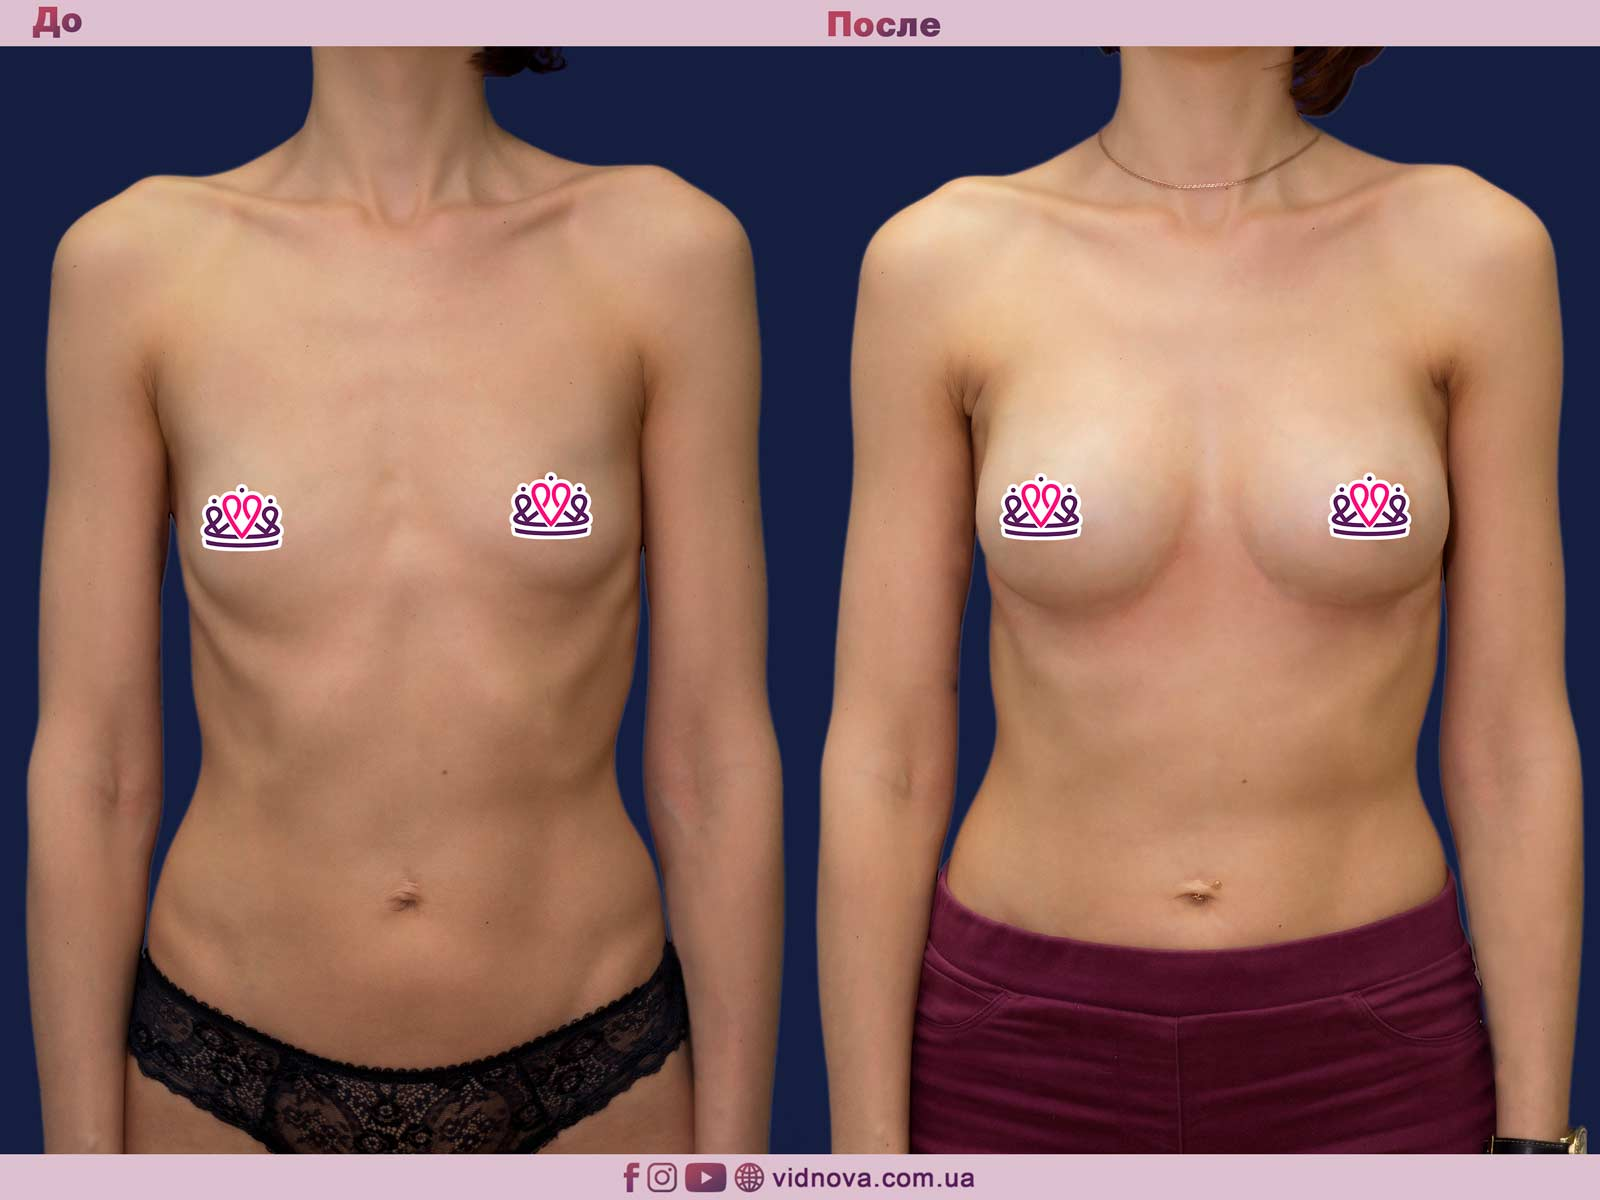 Увеличение груди: Фото ДО и ПОСЛЕ - Пример №76-1 - Клиника Vidnova